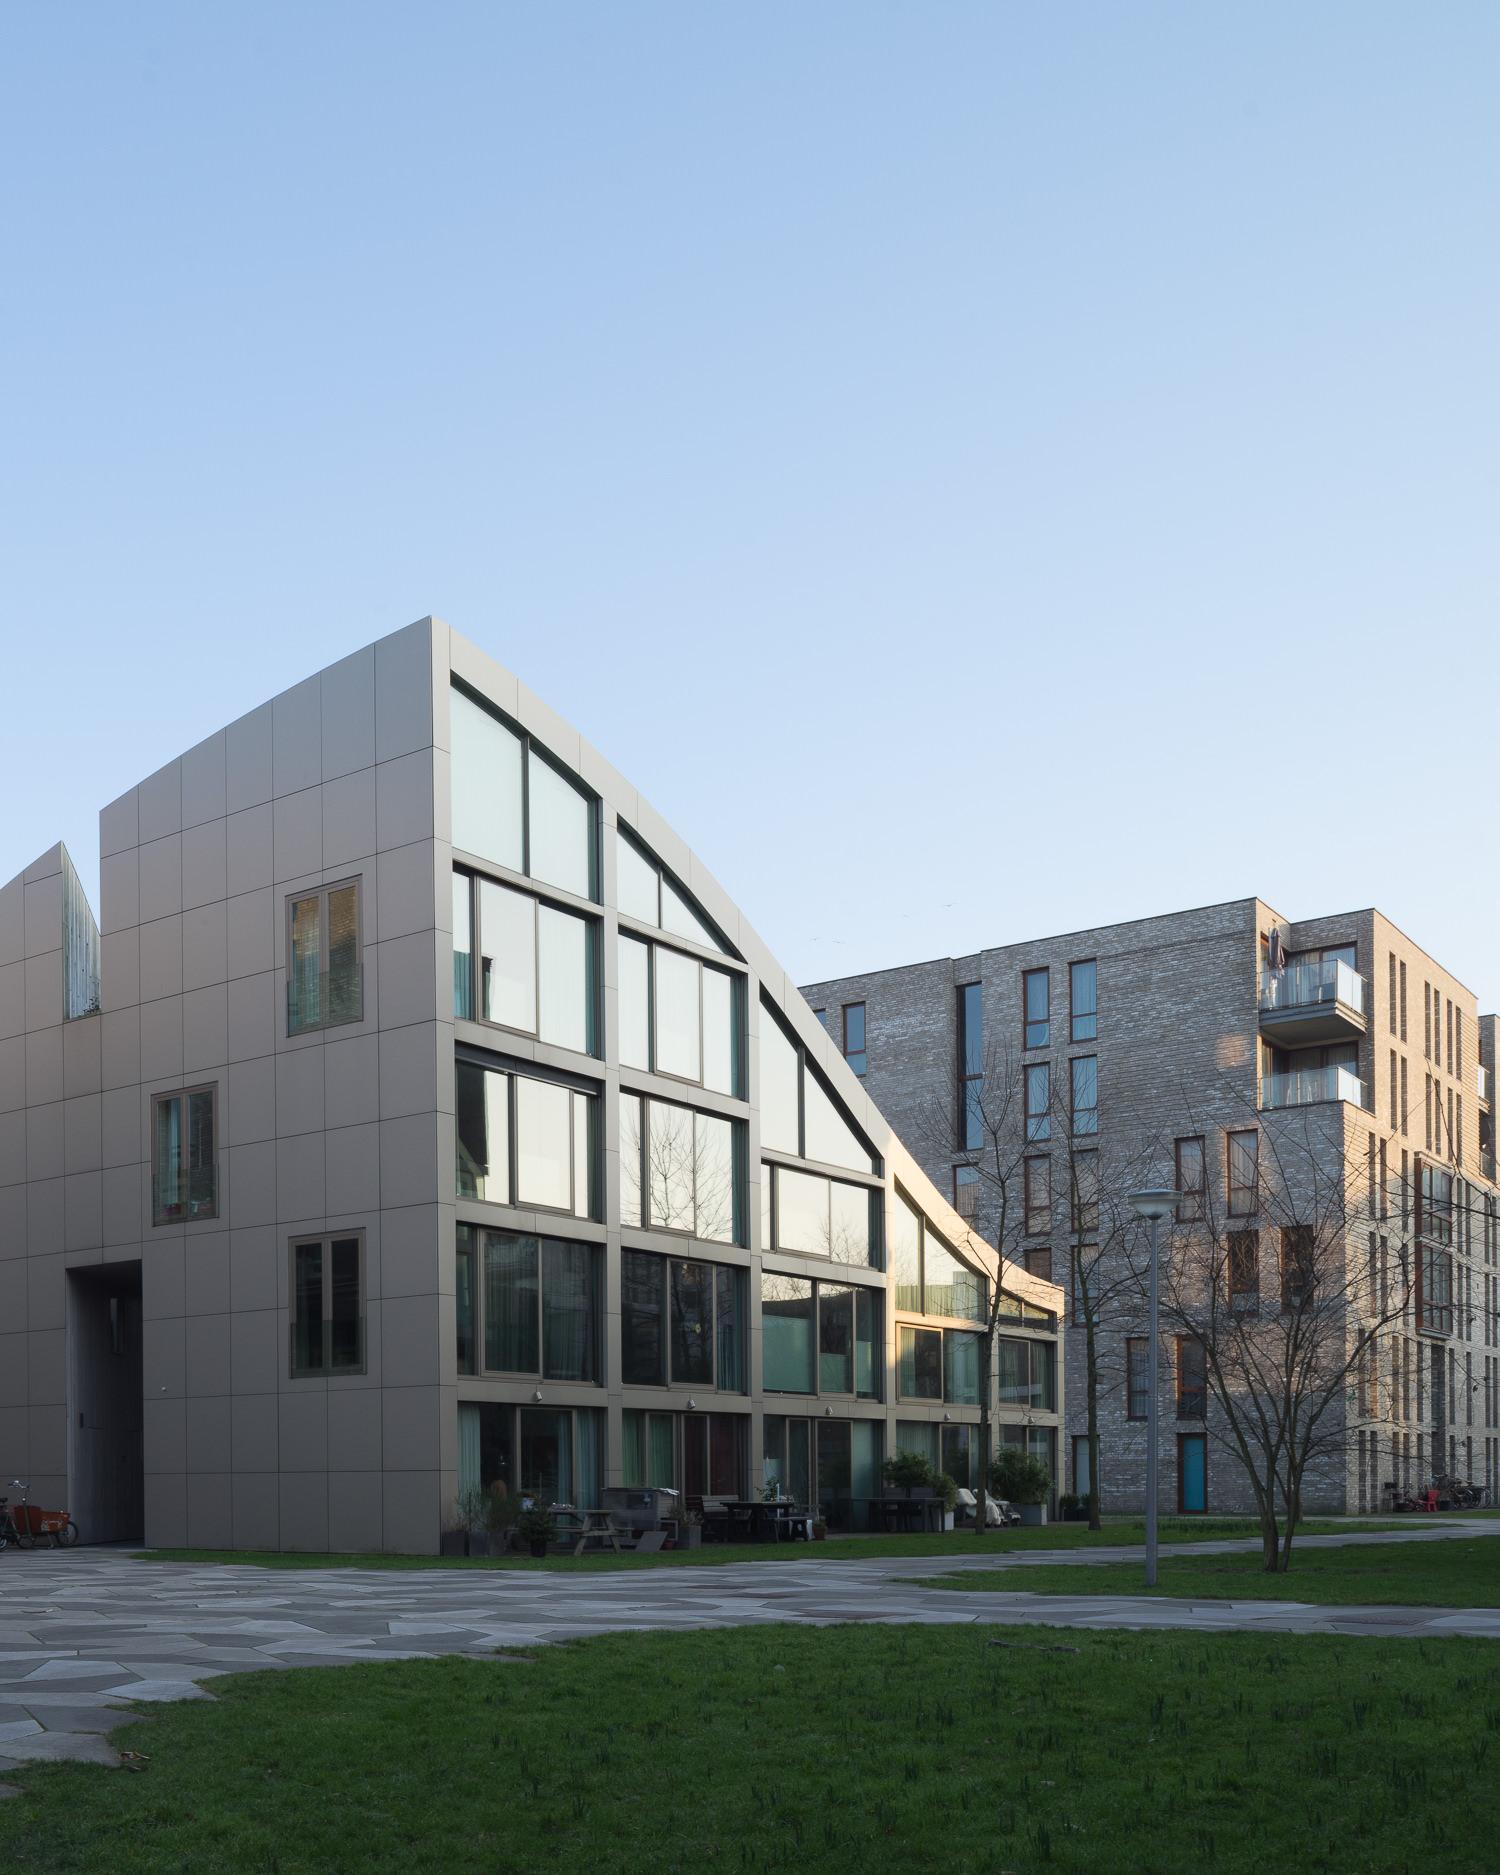 amsterdam-modern-architecture-facade-het-funen-mark-hadden-photography-architectuurfotograaf-007.jpg